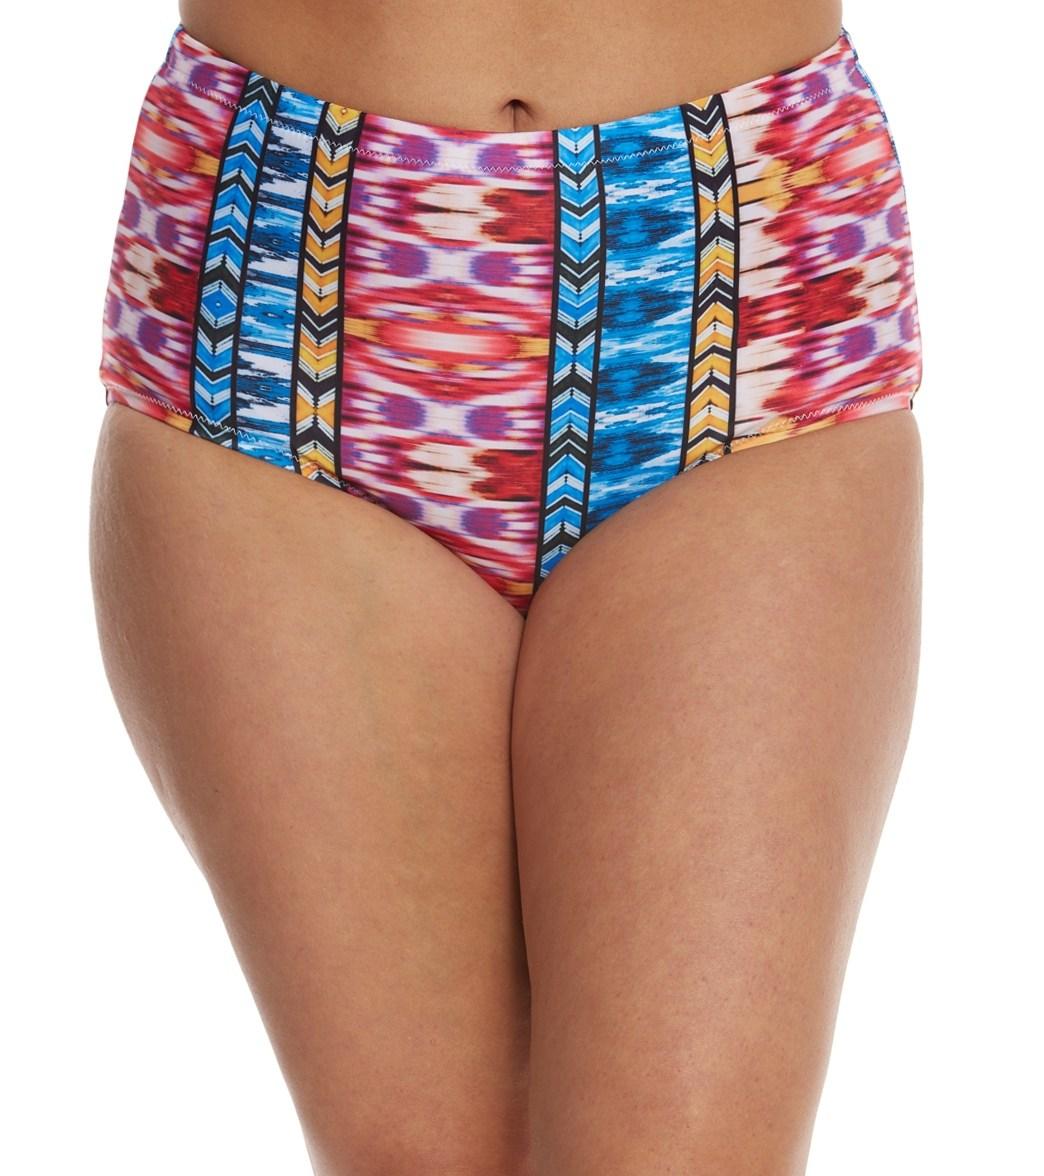 4dcf4f4582a Raisins Curve Plus Size Around The World Shoreline High Waist Bikini Bottom  at SwimOutlet.com